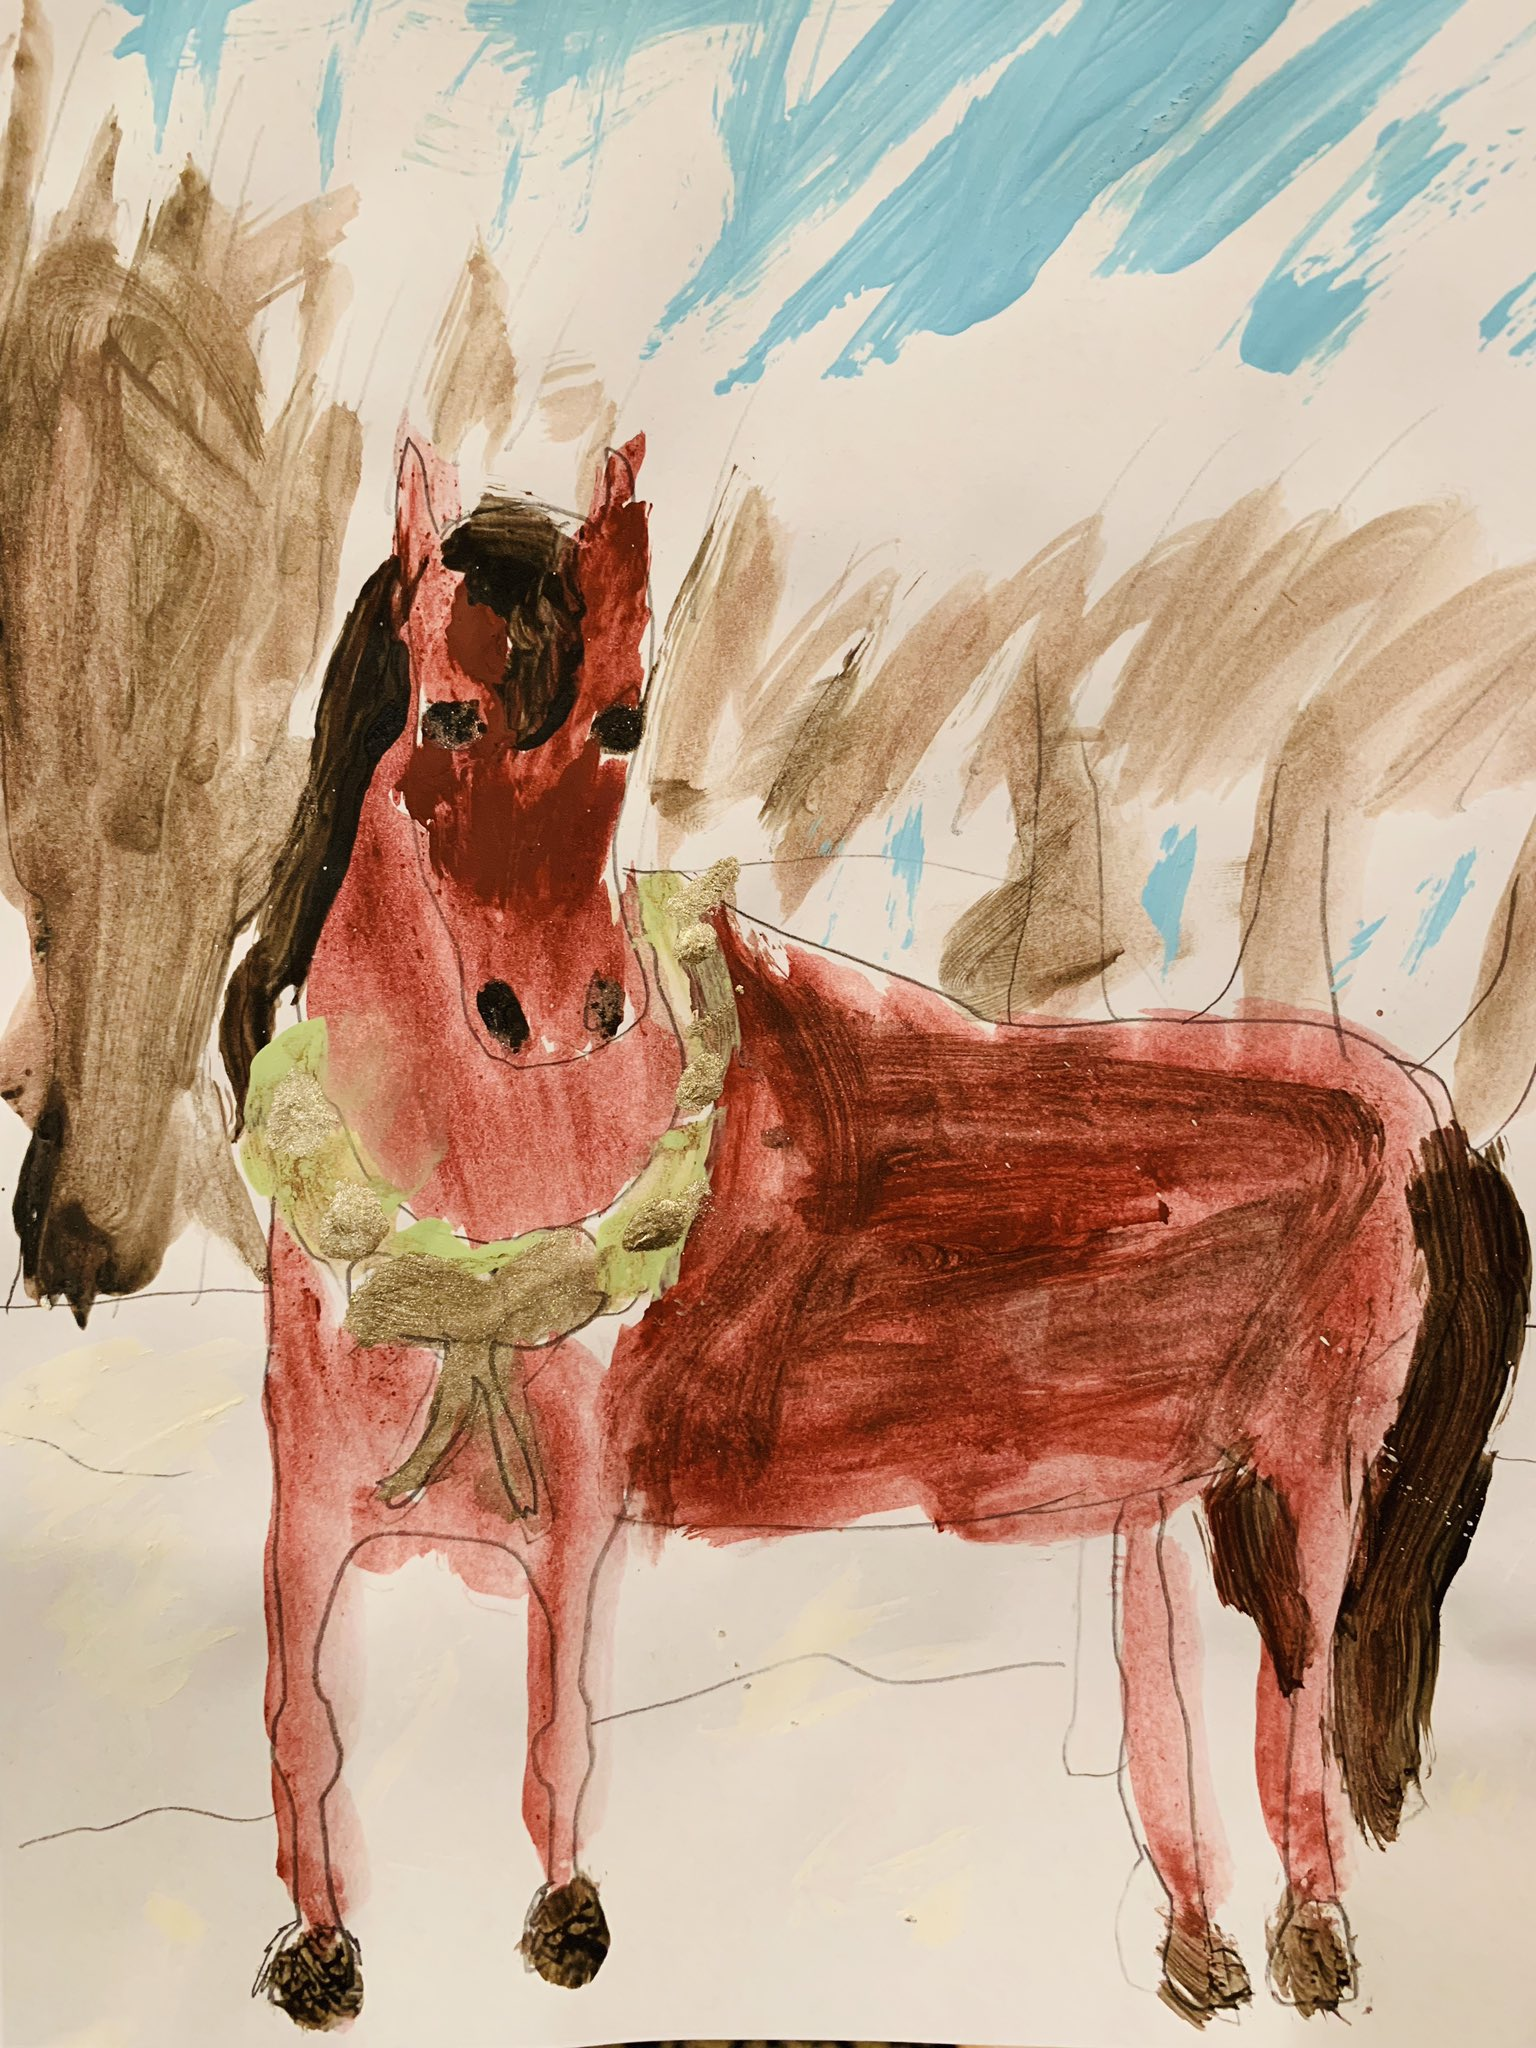 My Daughter's Drawing to Santa